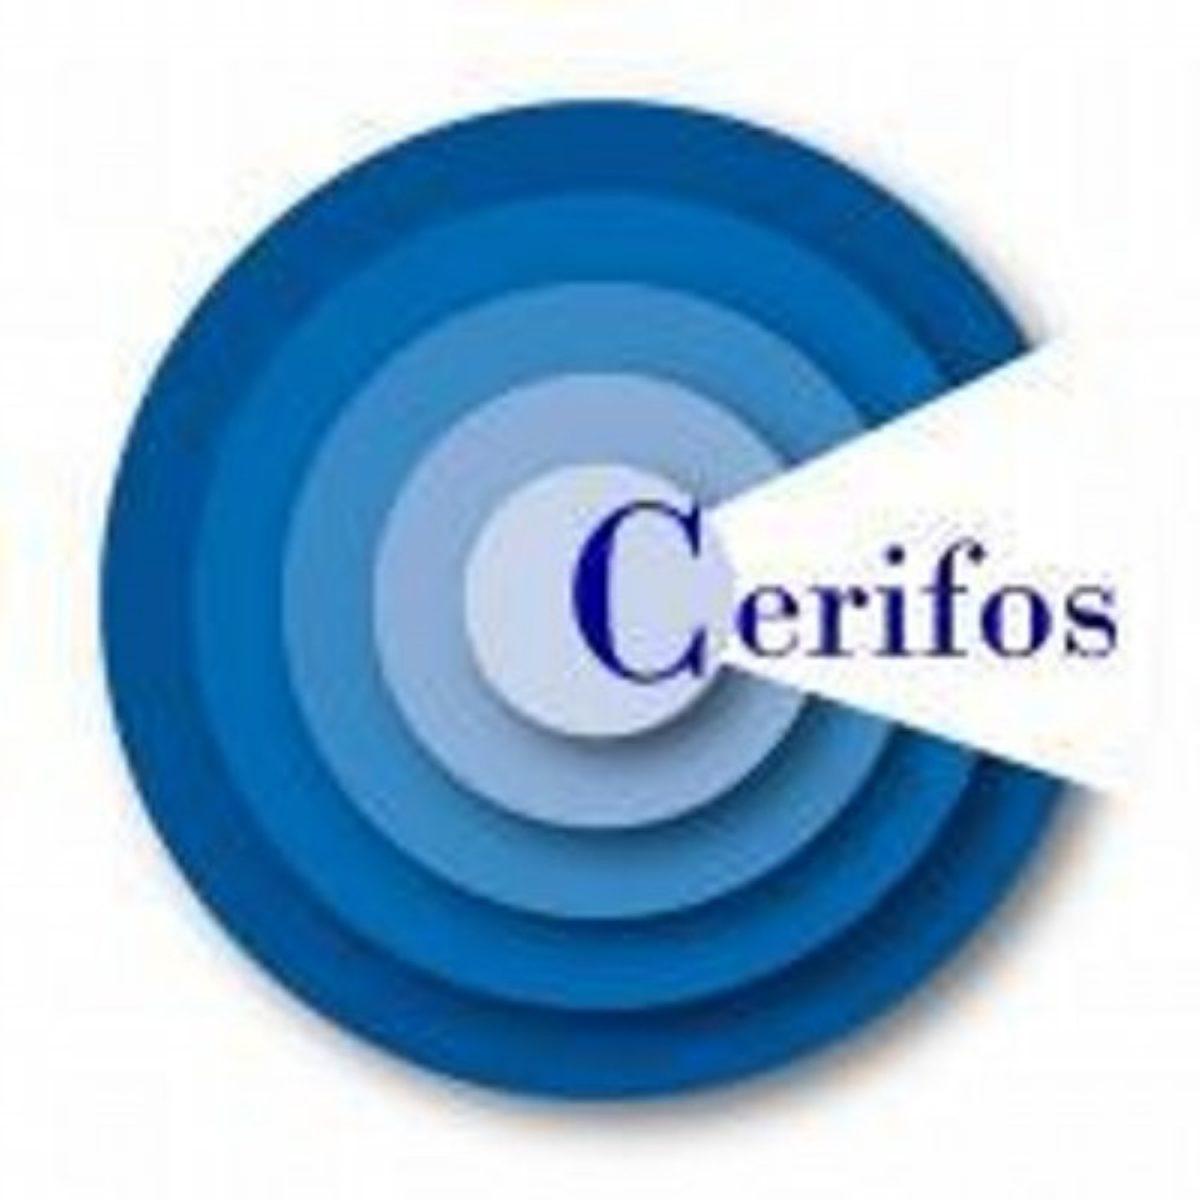 Ti presento Cerifos